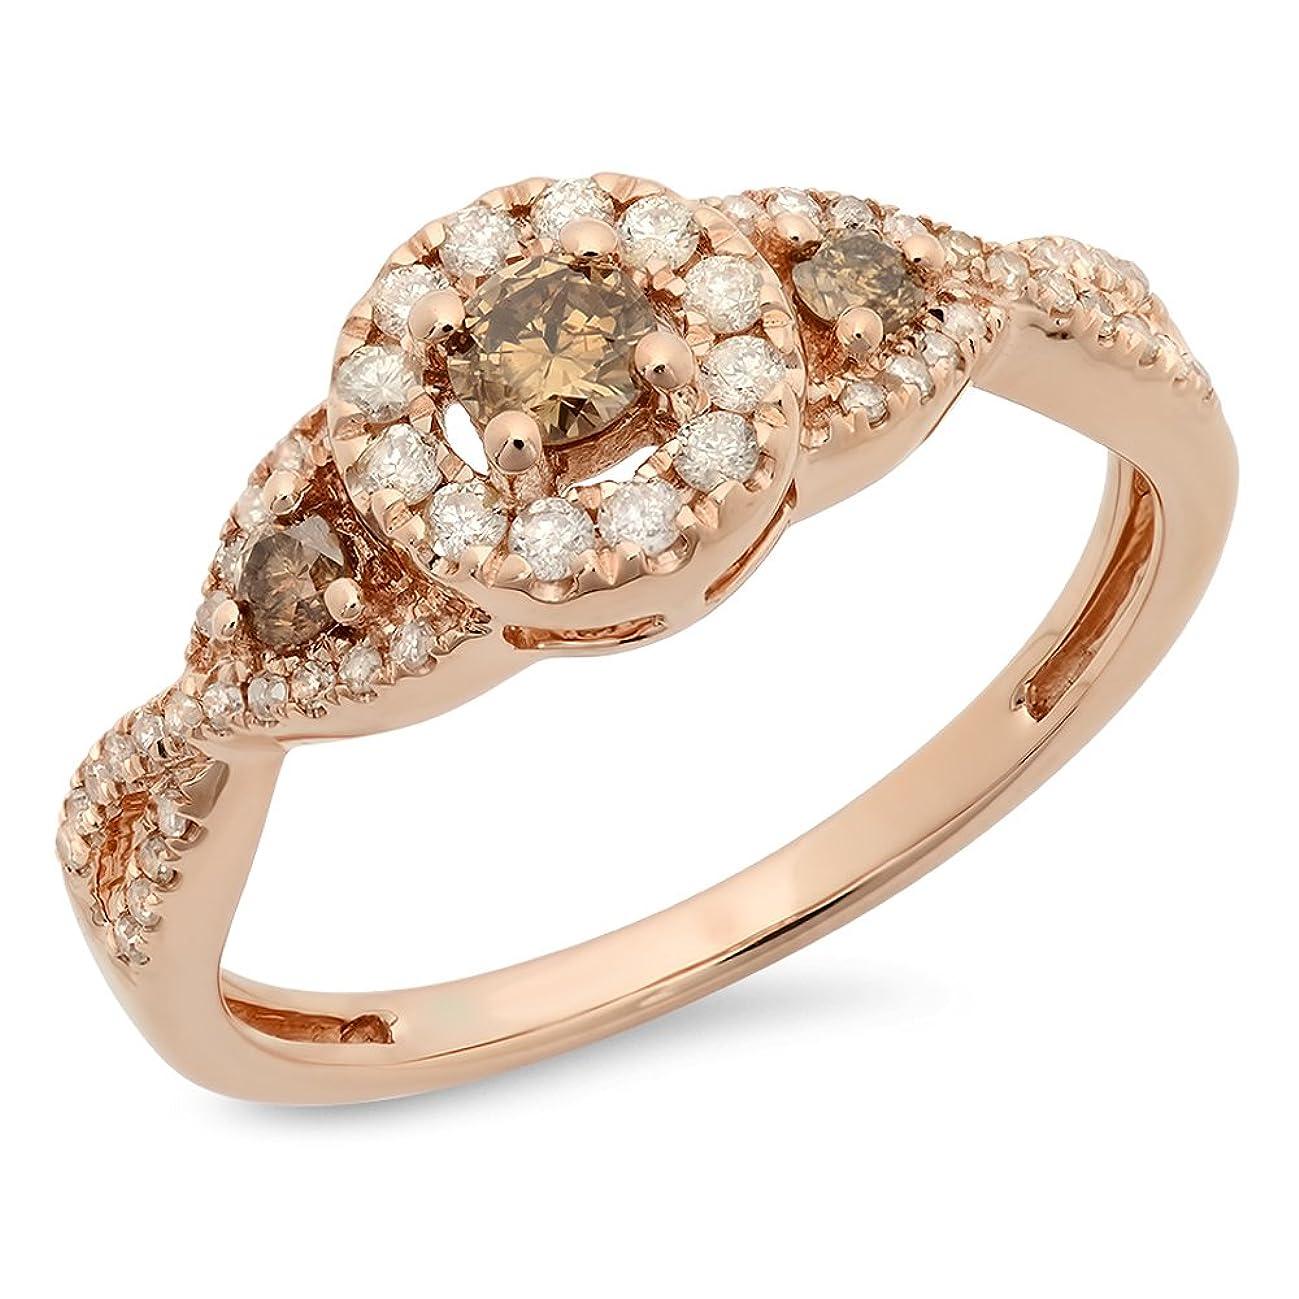 Dazzlingrock Collection 0.50 Carat (ctw) 10K Champagne & White Diamond 3 Stone Halo Bridal Engagement Ring 1/2 CT, Rose Gold